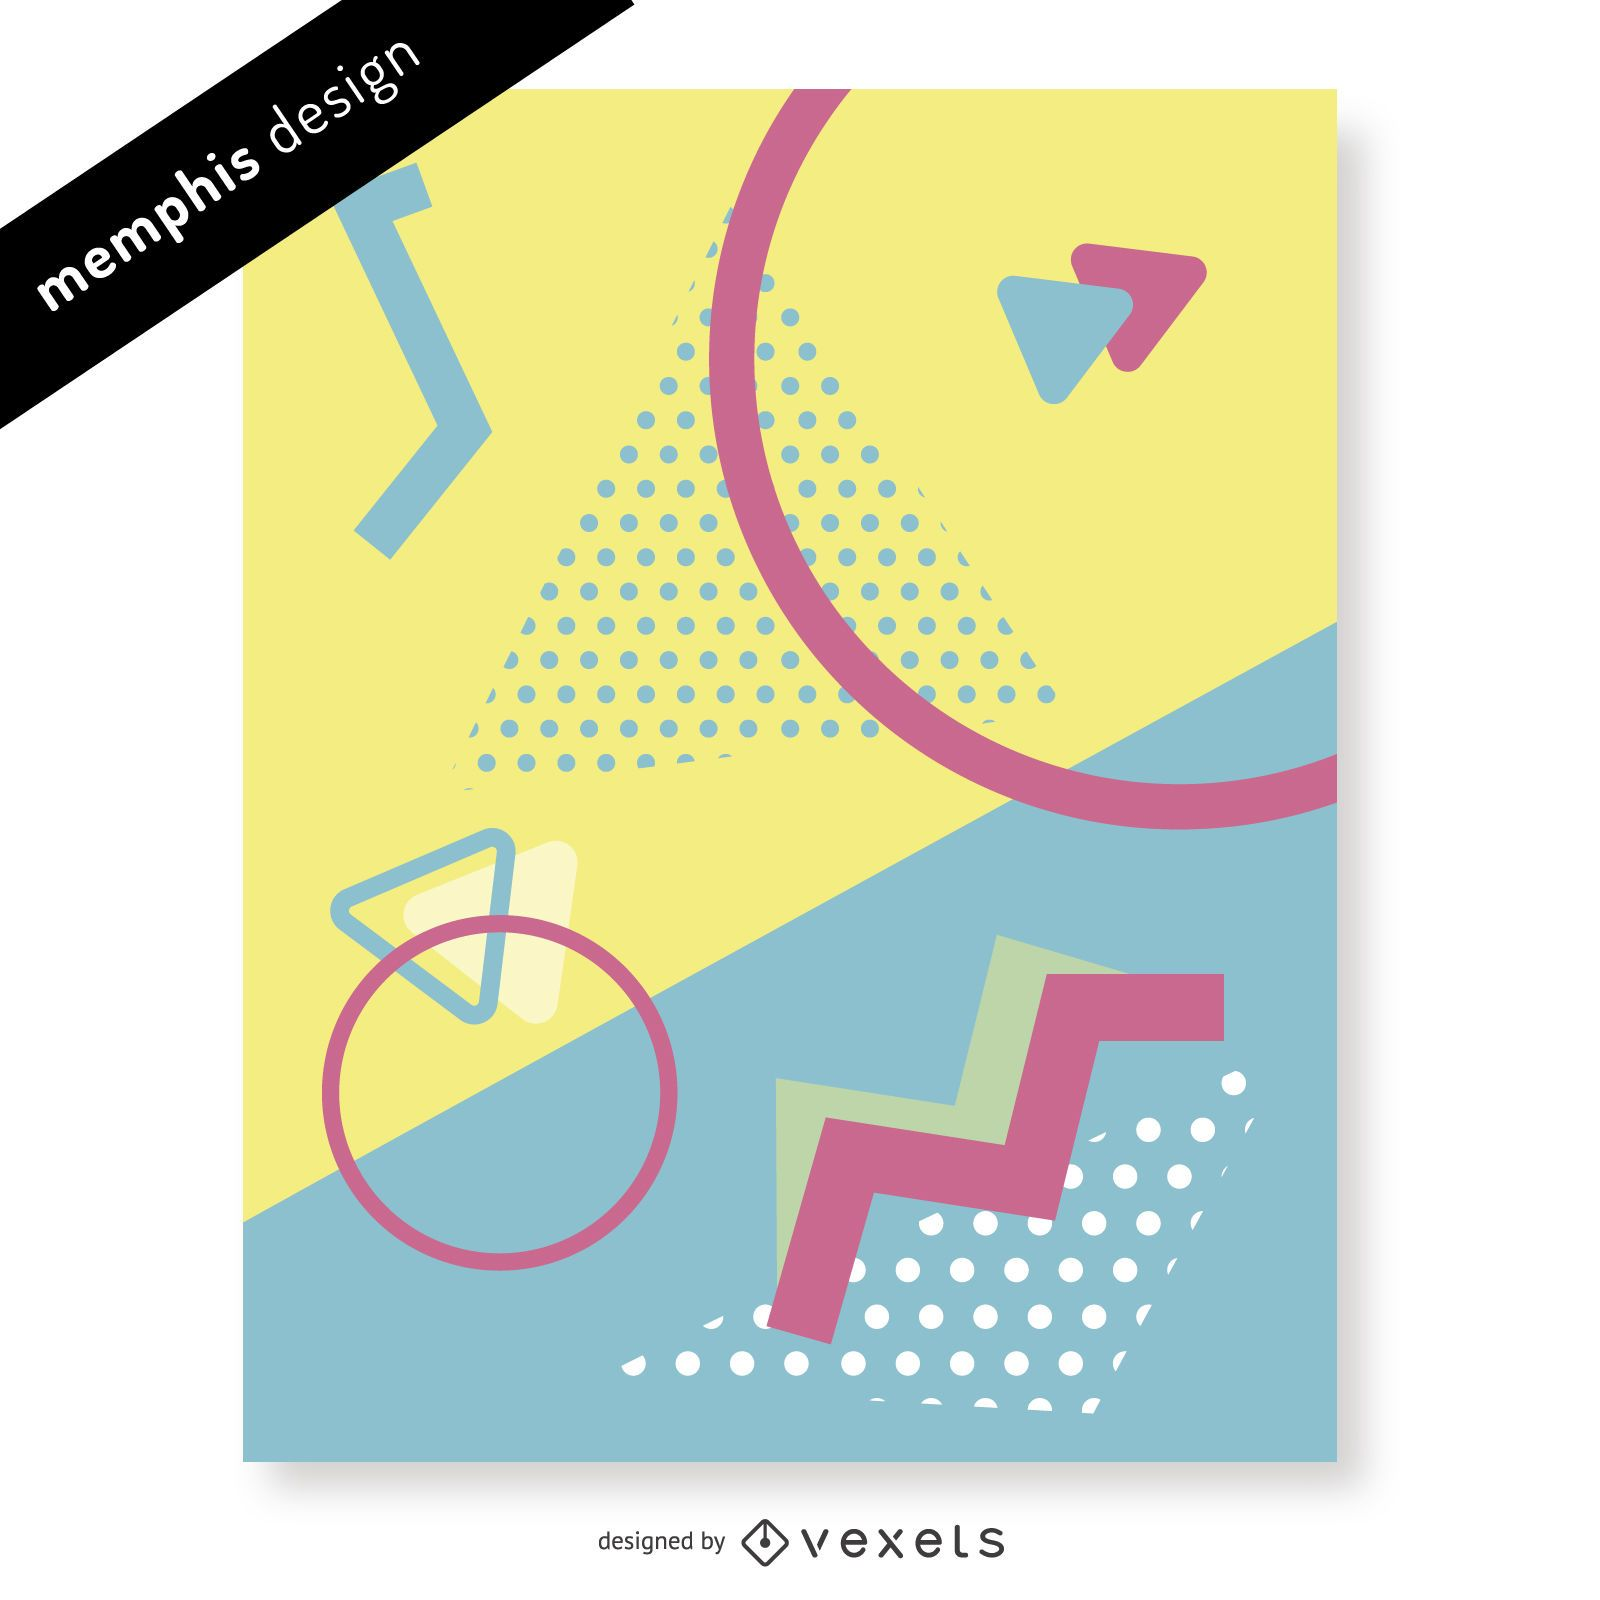 90s memphis geometric design